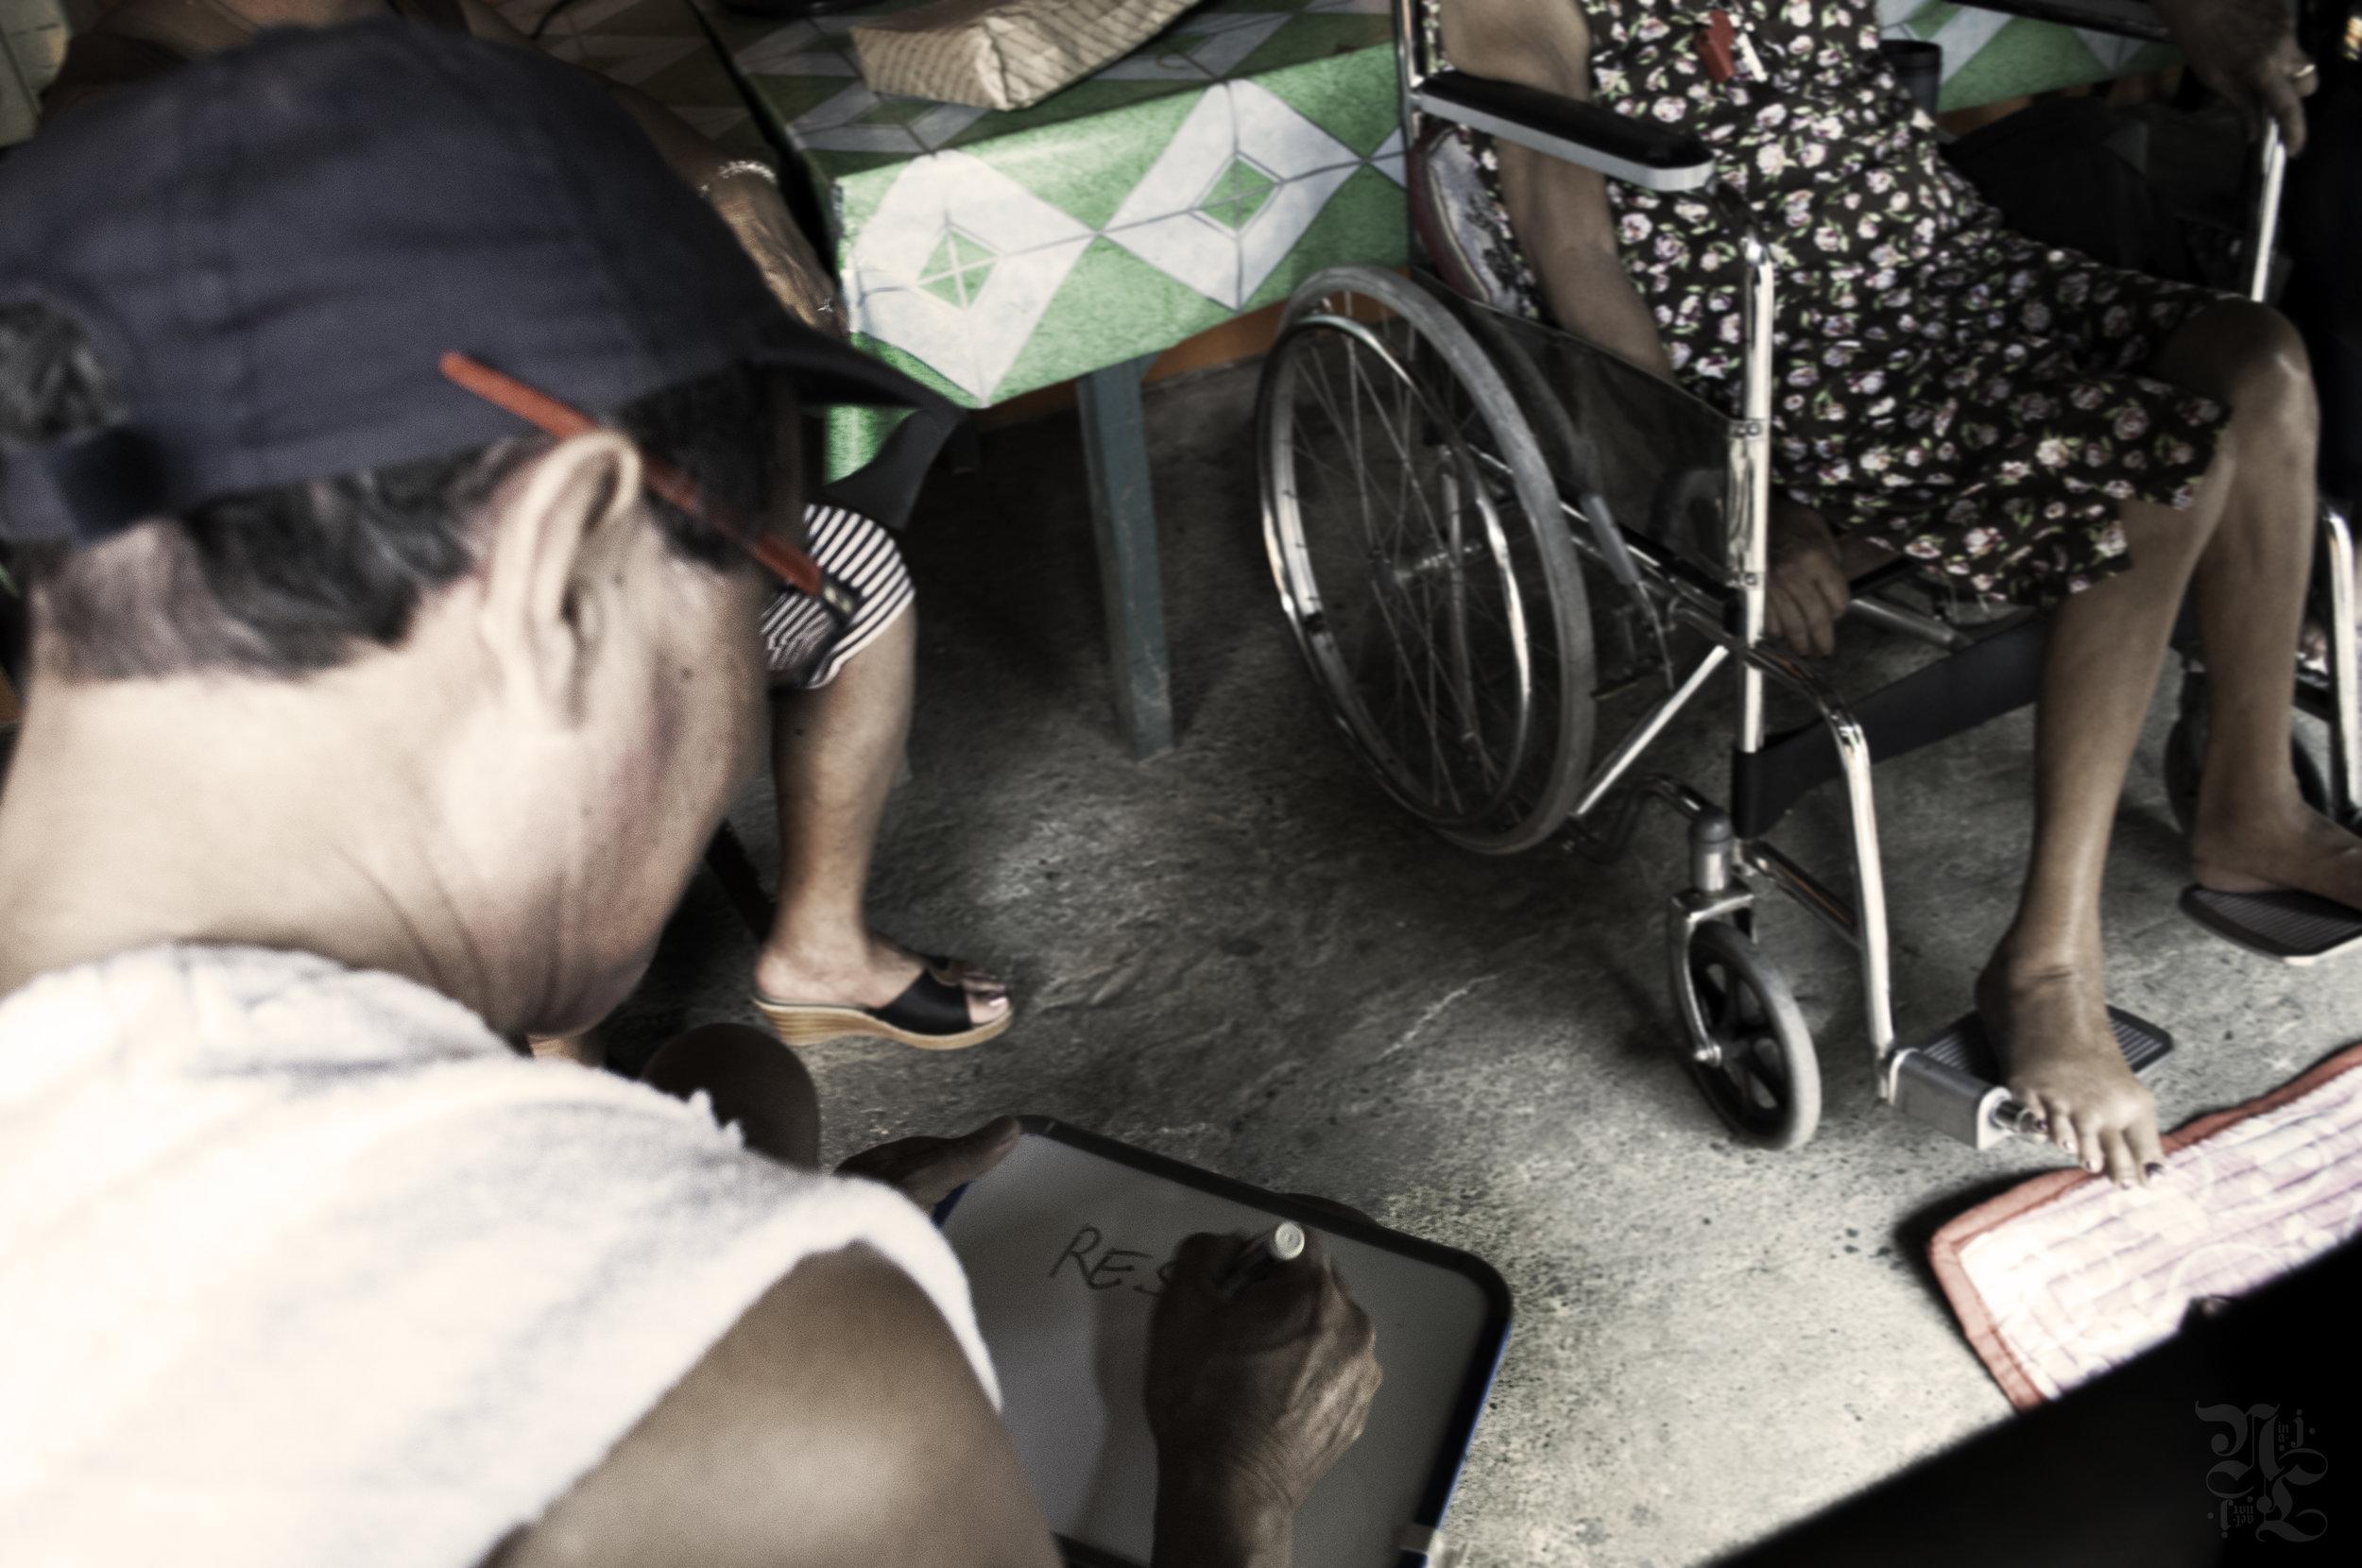 Man dictates dialogue to an elderly, deaf woman